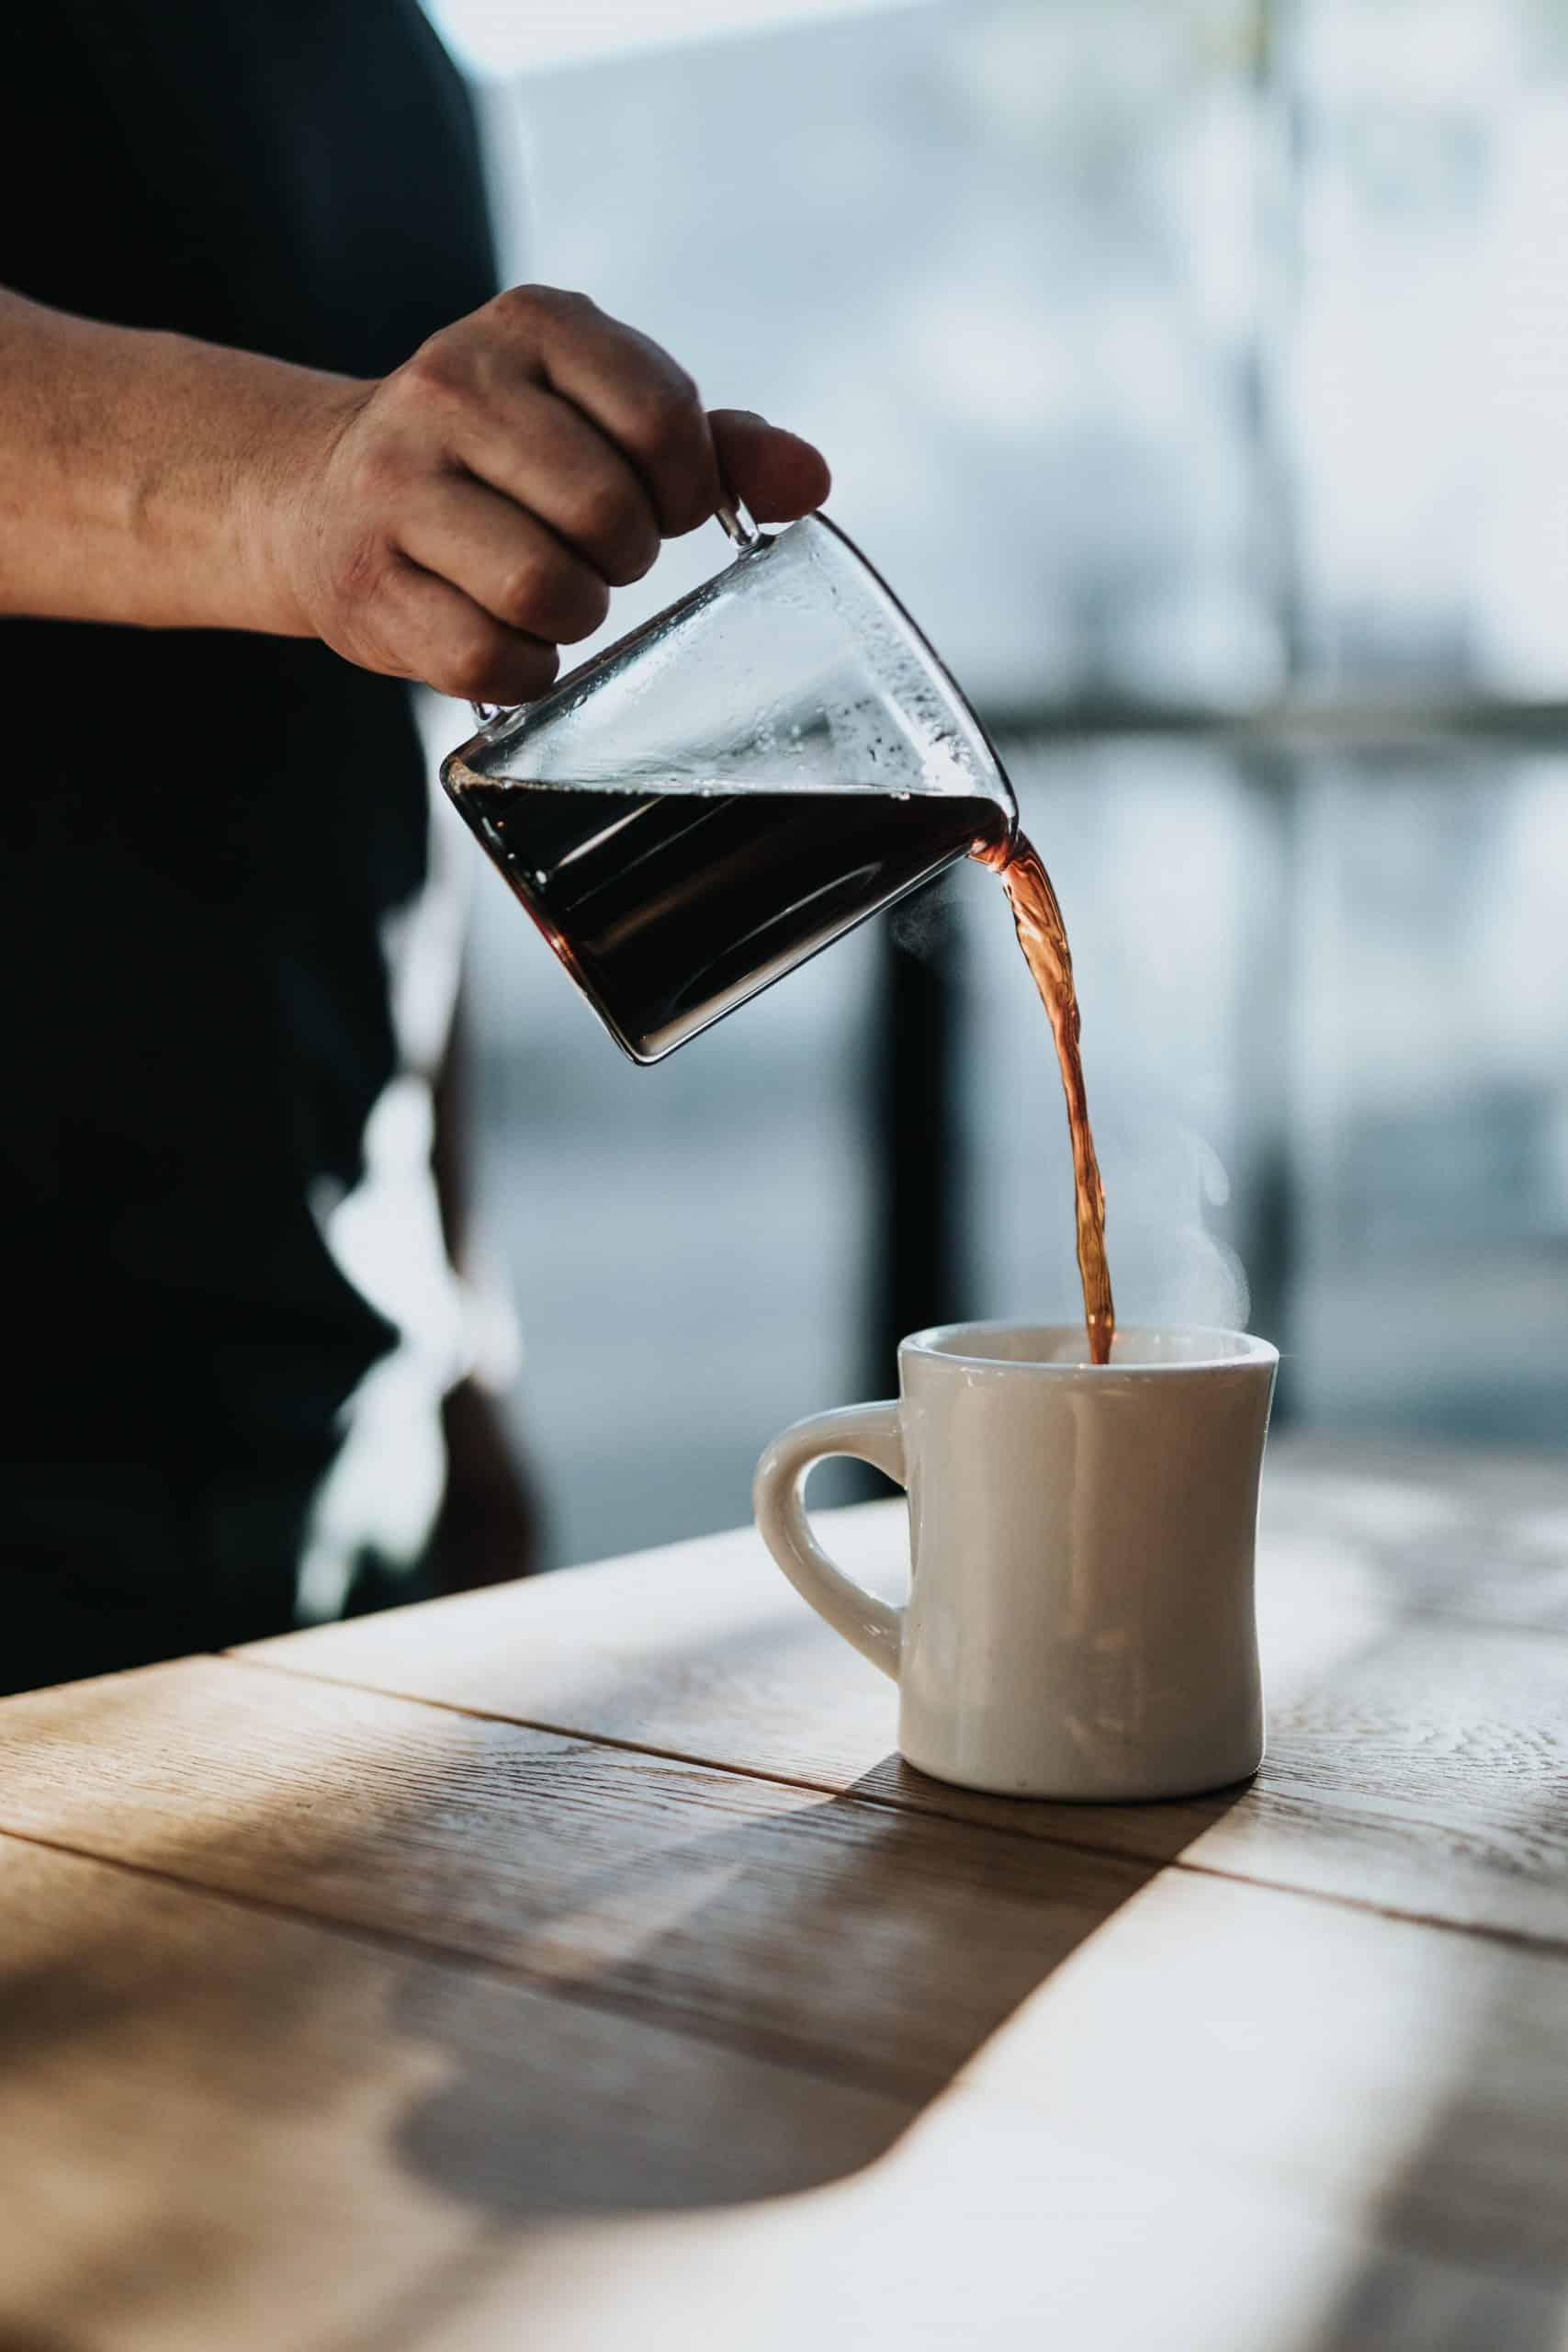 person pouring black coffee into white ceramic mug